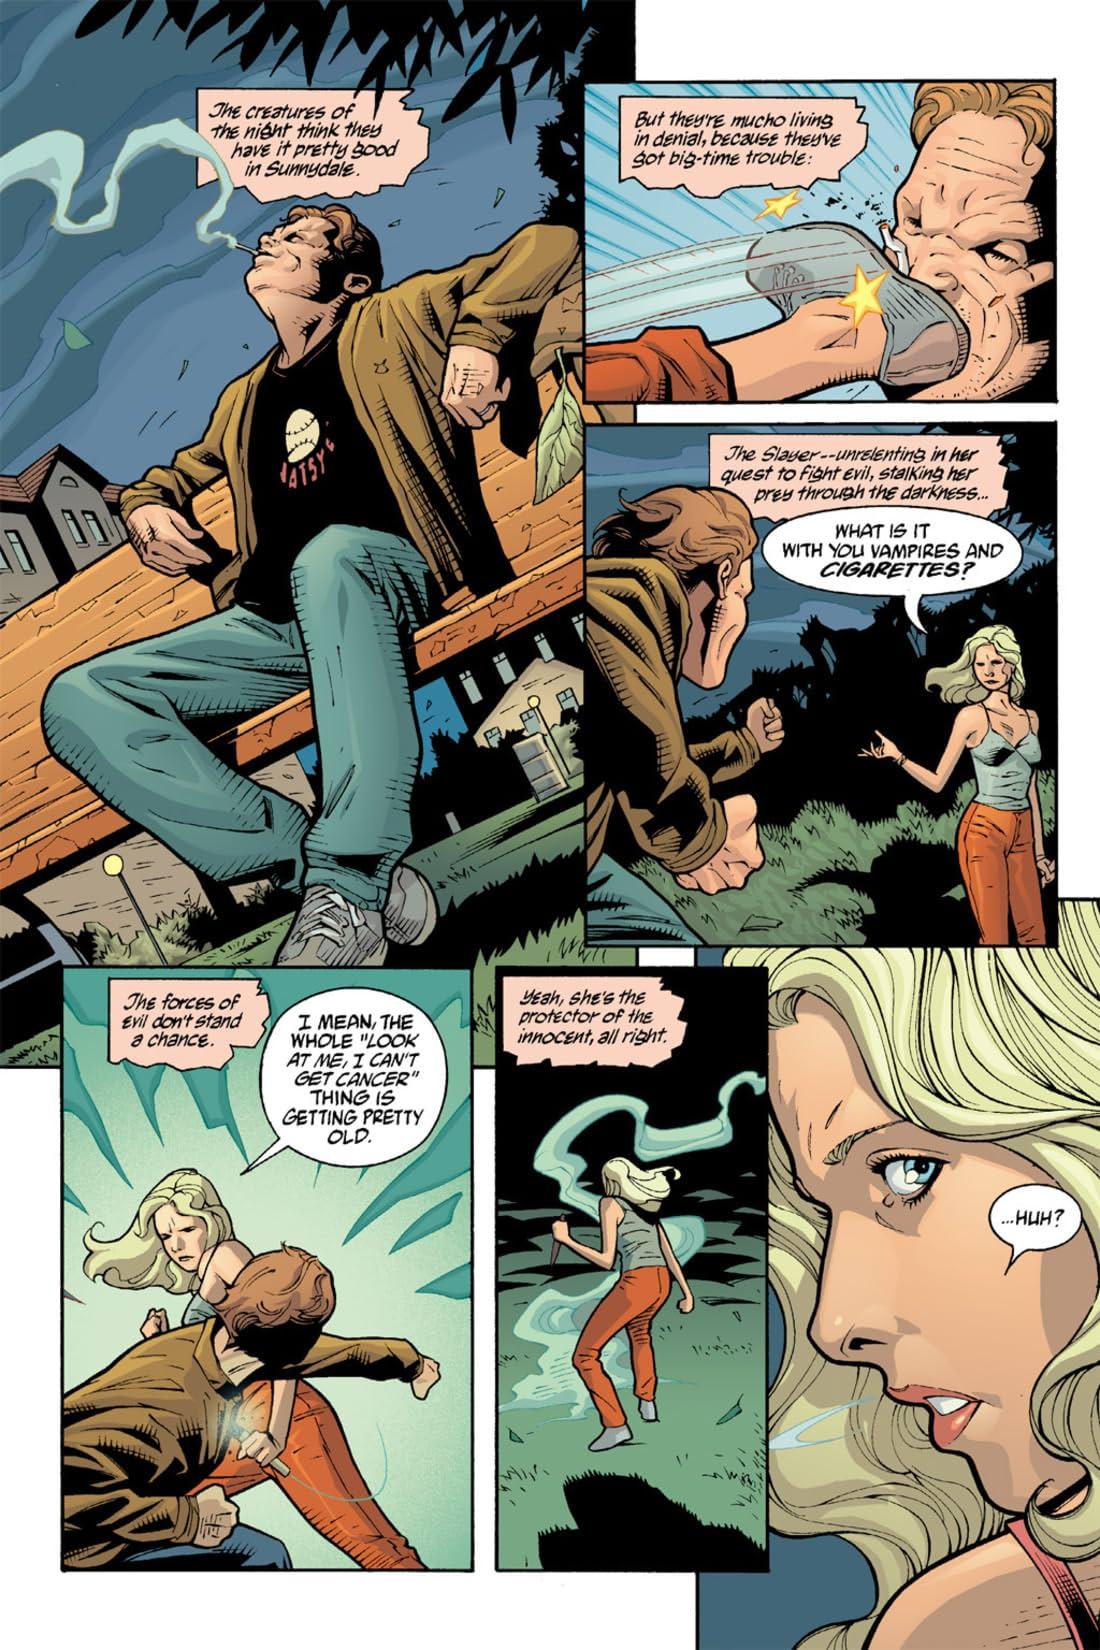 Buffy the Vampire Slayer Classic #41: False Memories